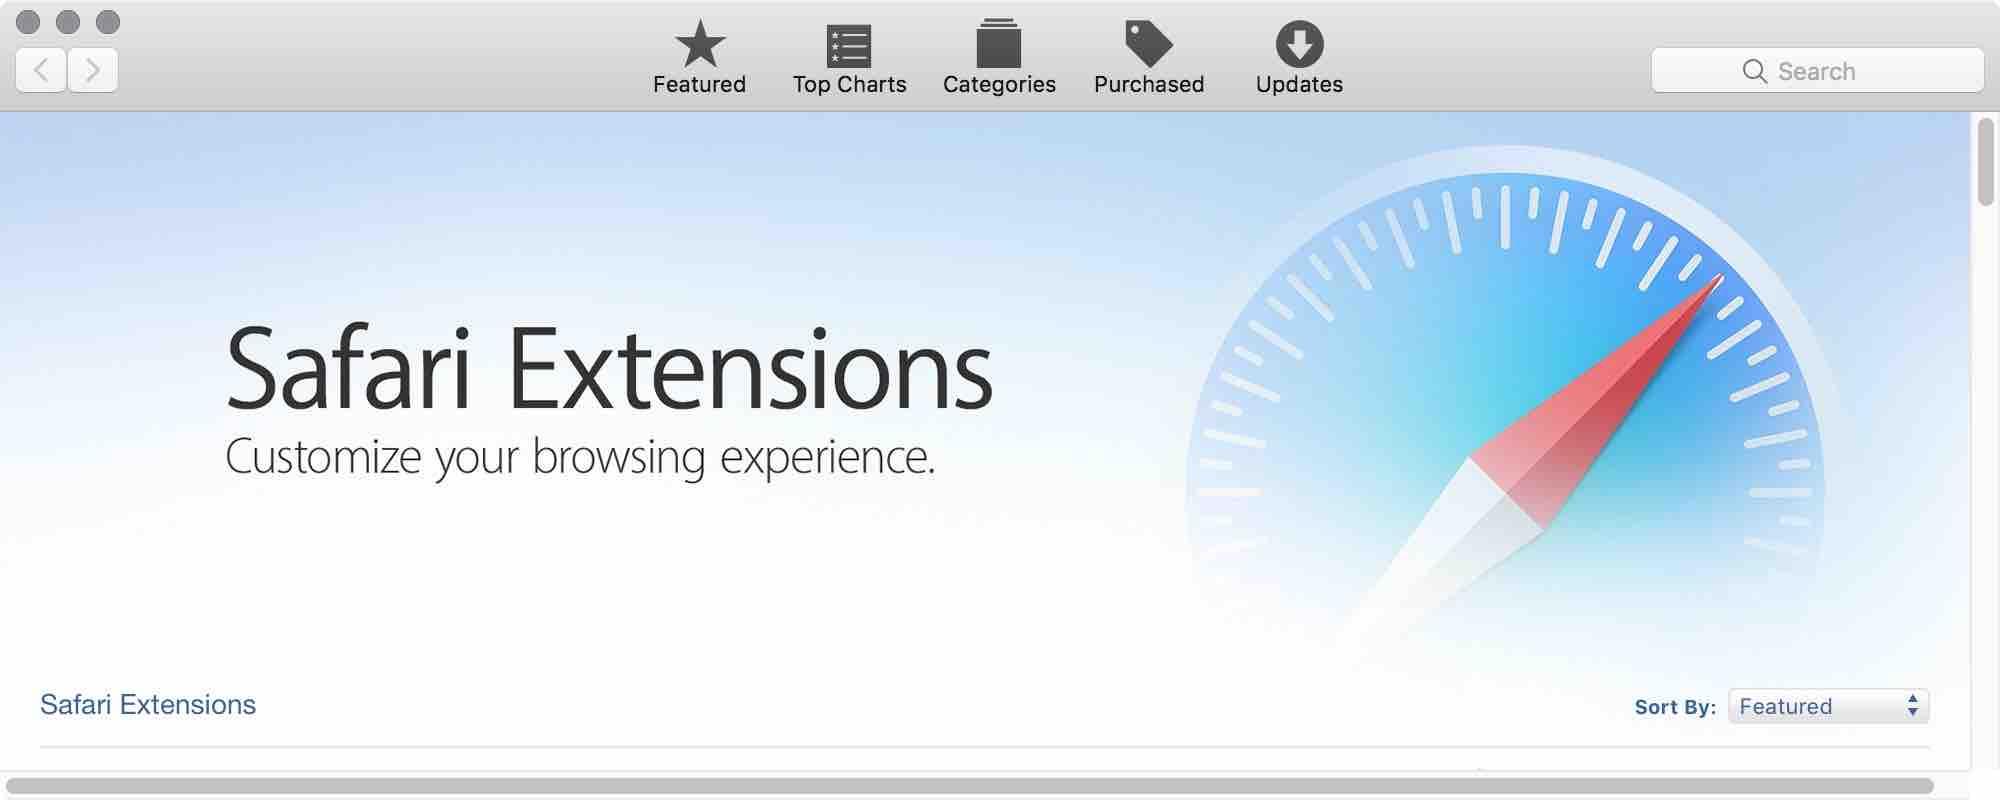 The Mac App Store Safari Extensions Experience